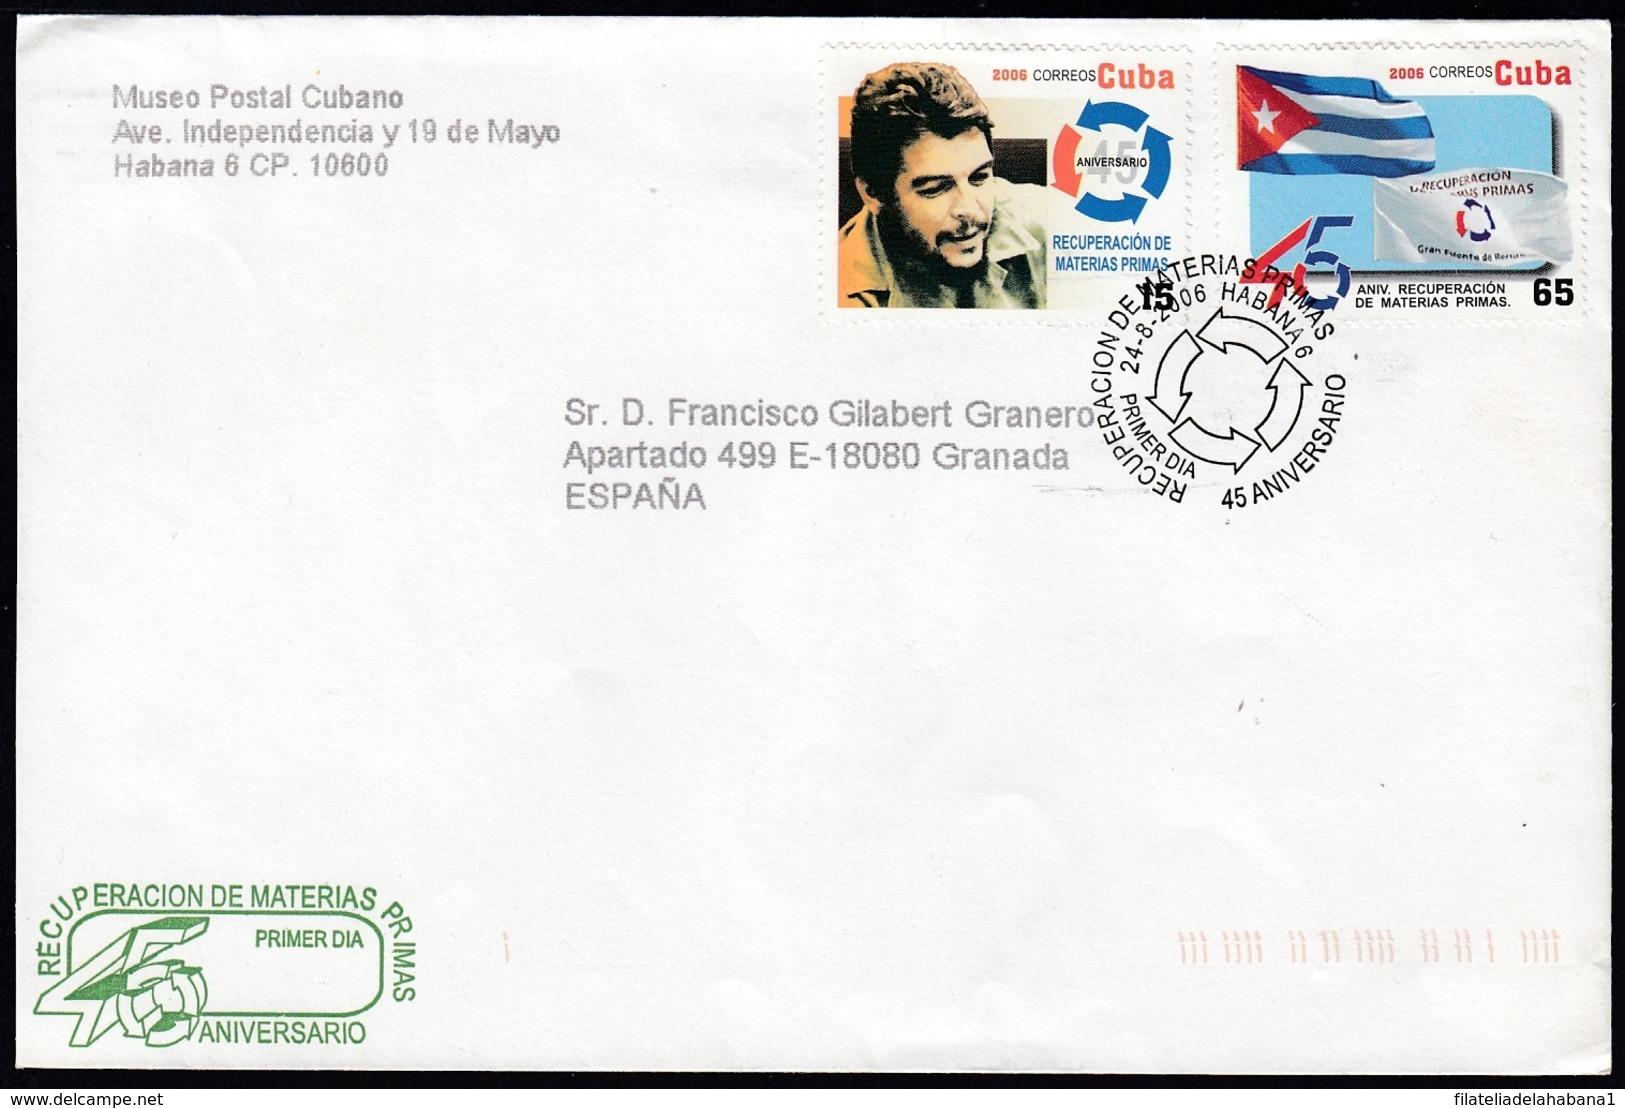 2006-FDC-128 CUBA FDC 2006. REGISTERED COVER TO SPAIN. MATERIAS PRIMAS, ERNESTO CHE GUEVARA. - FDC